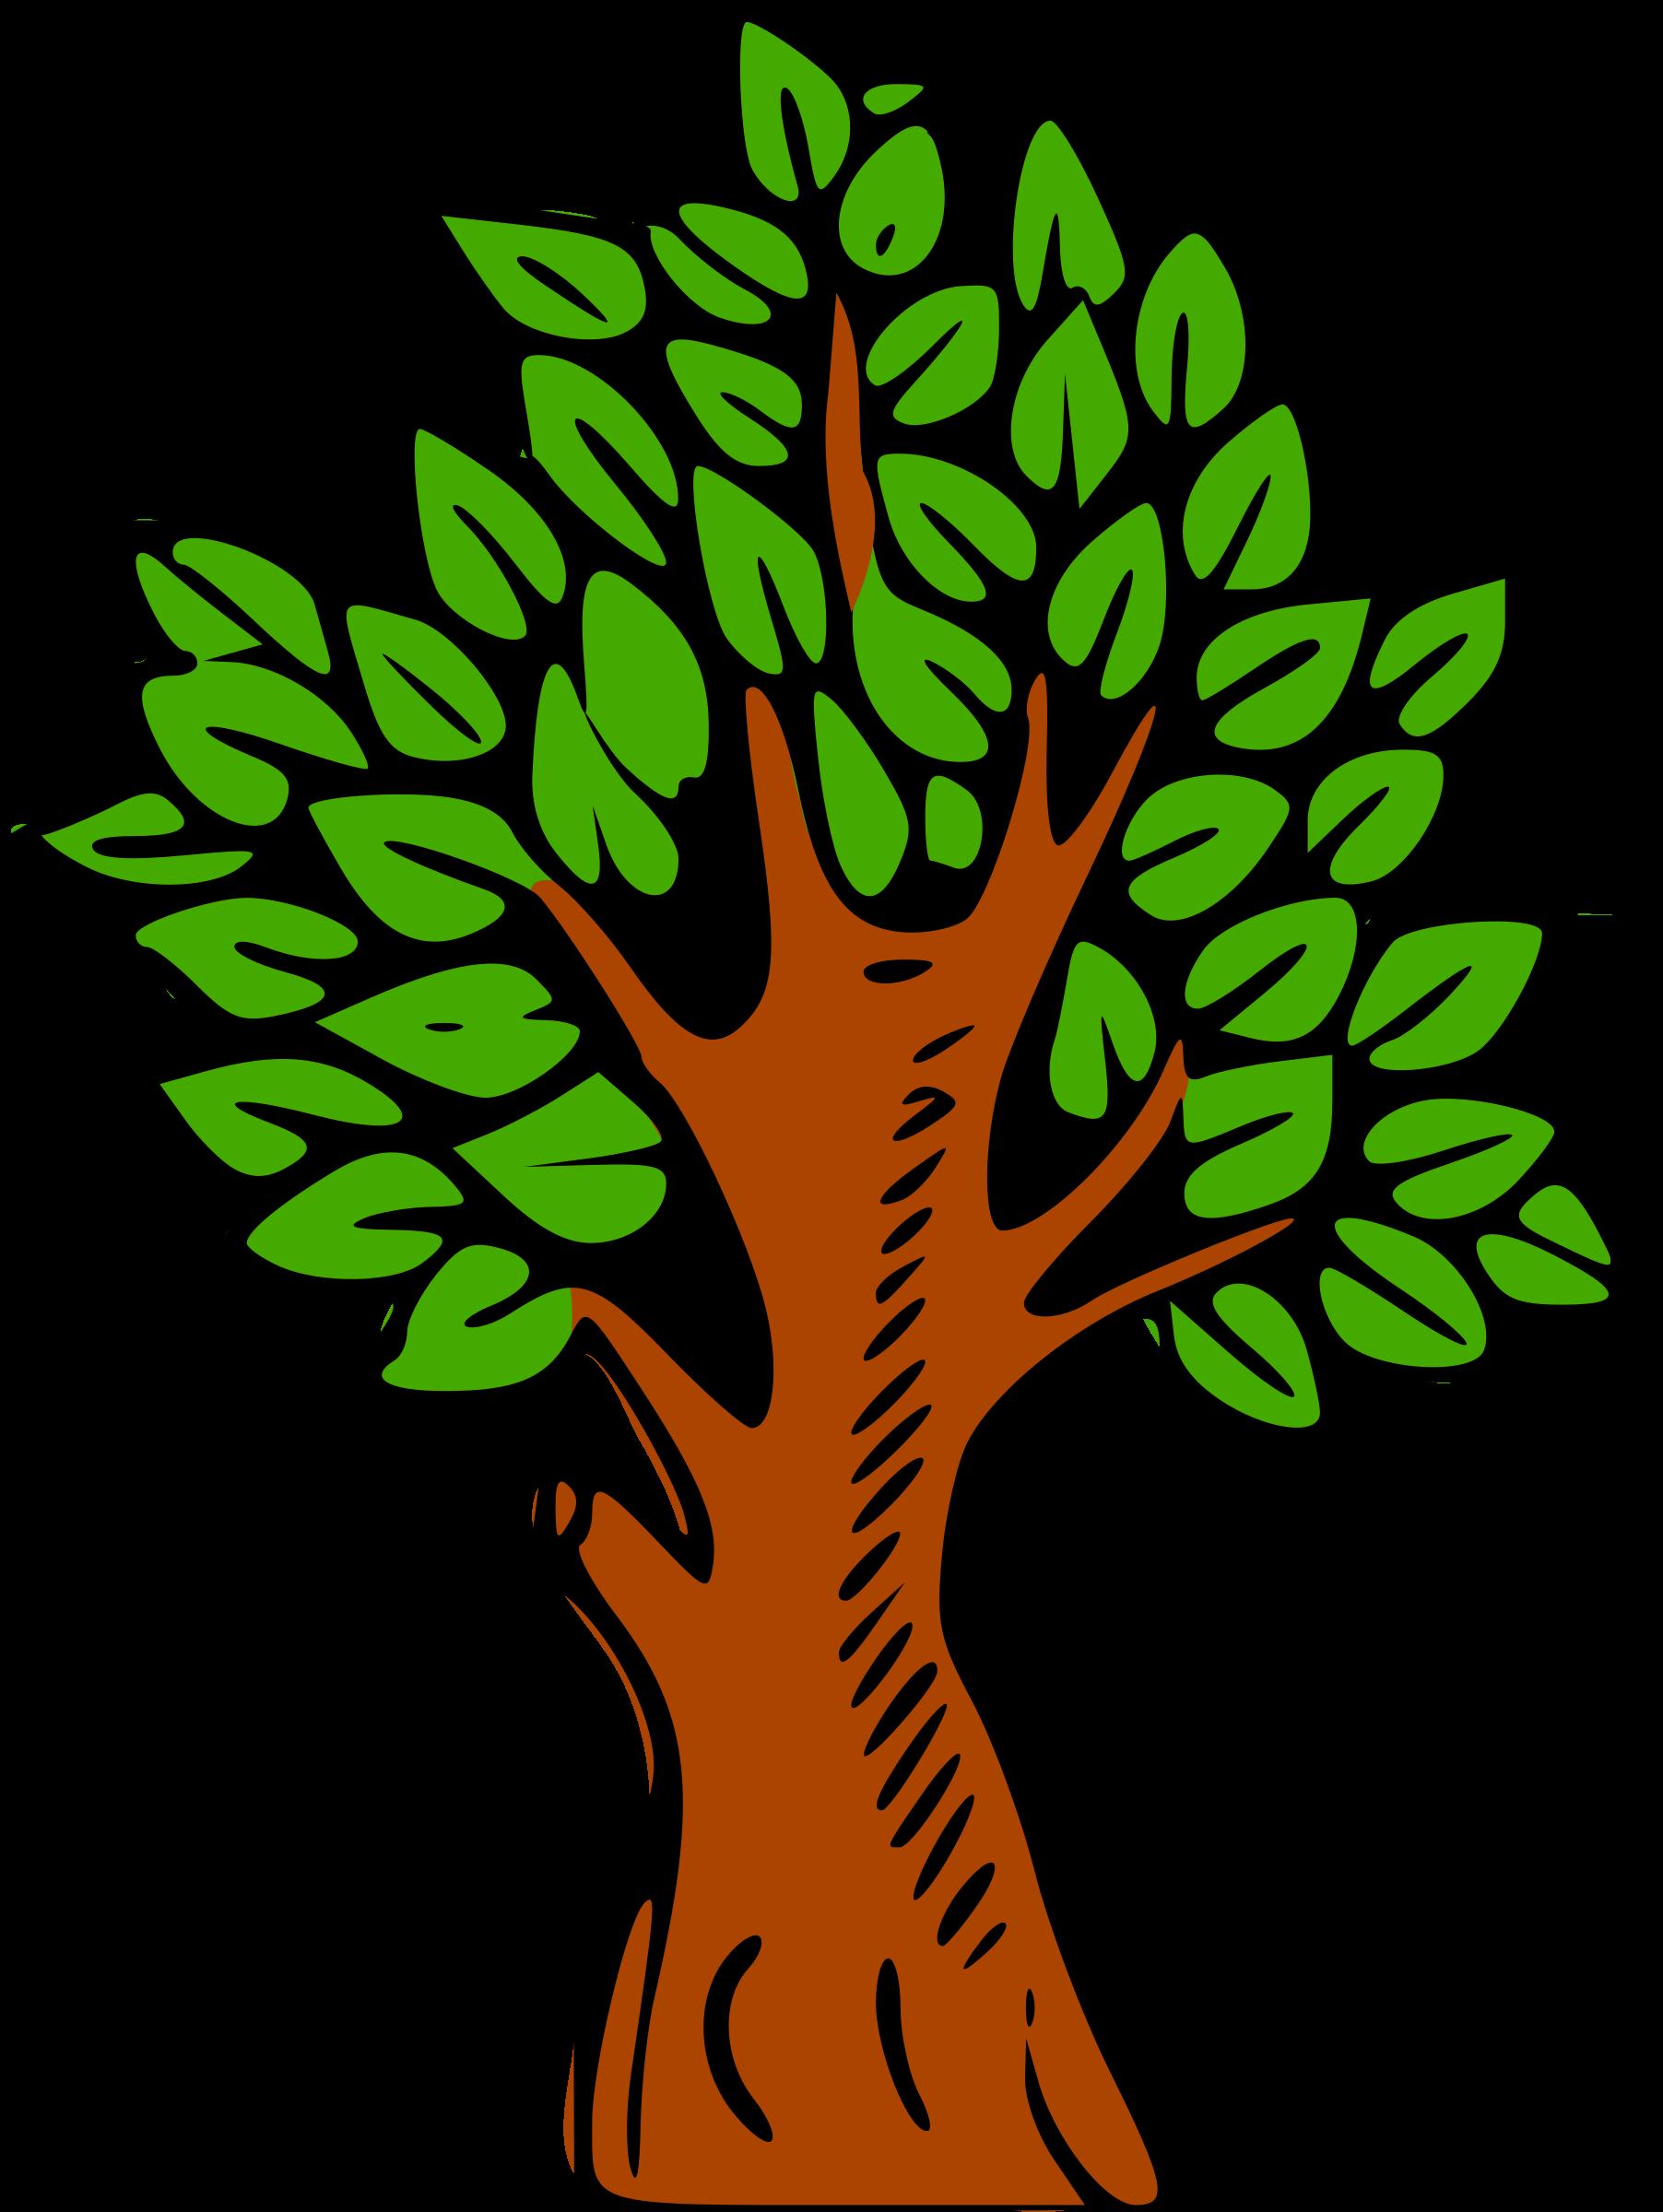 Tree clipart colour. Big image png